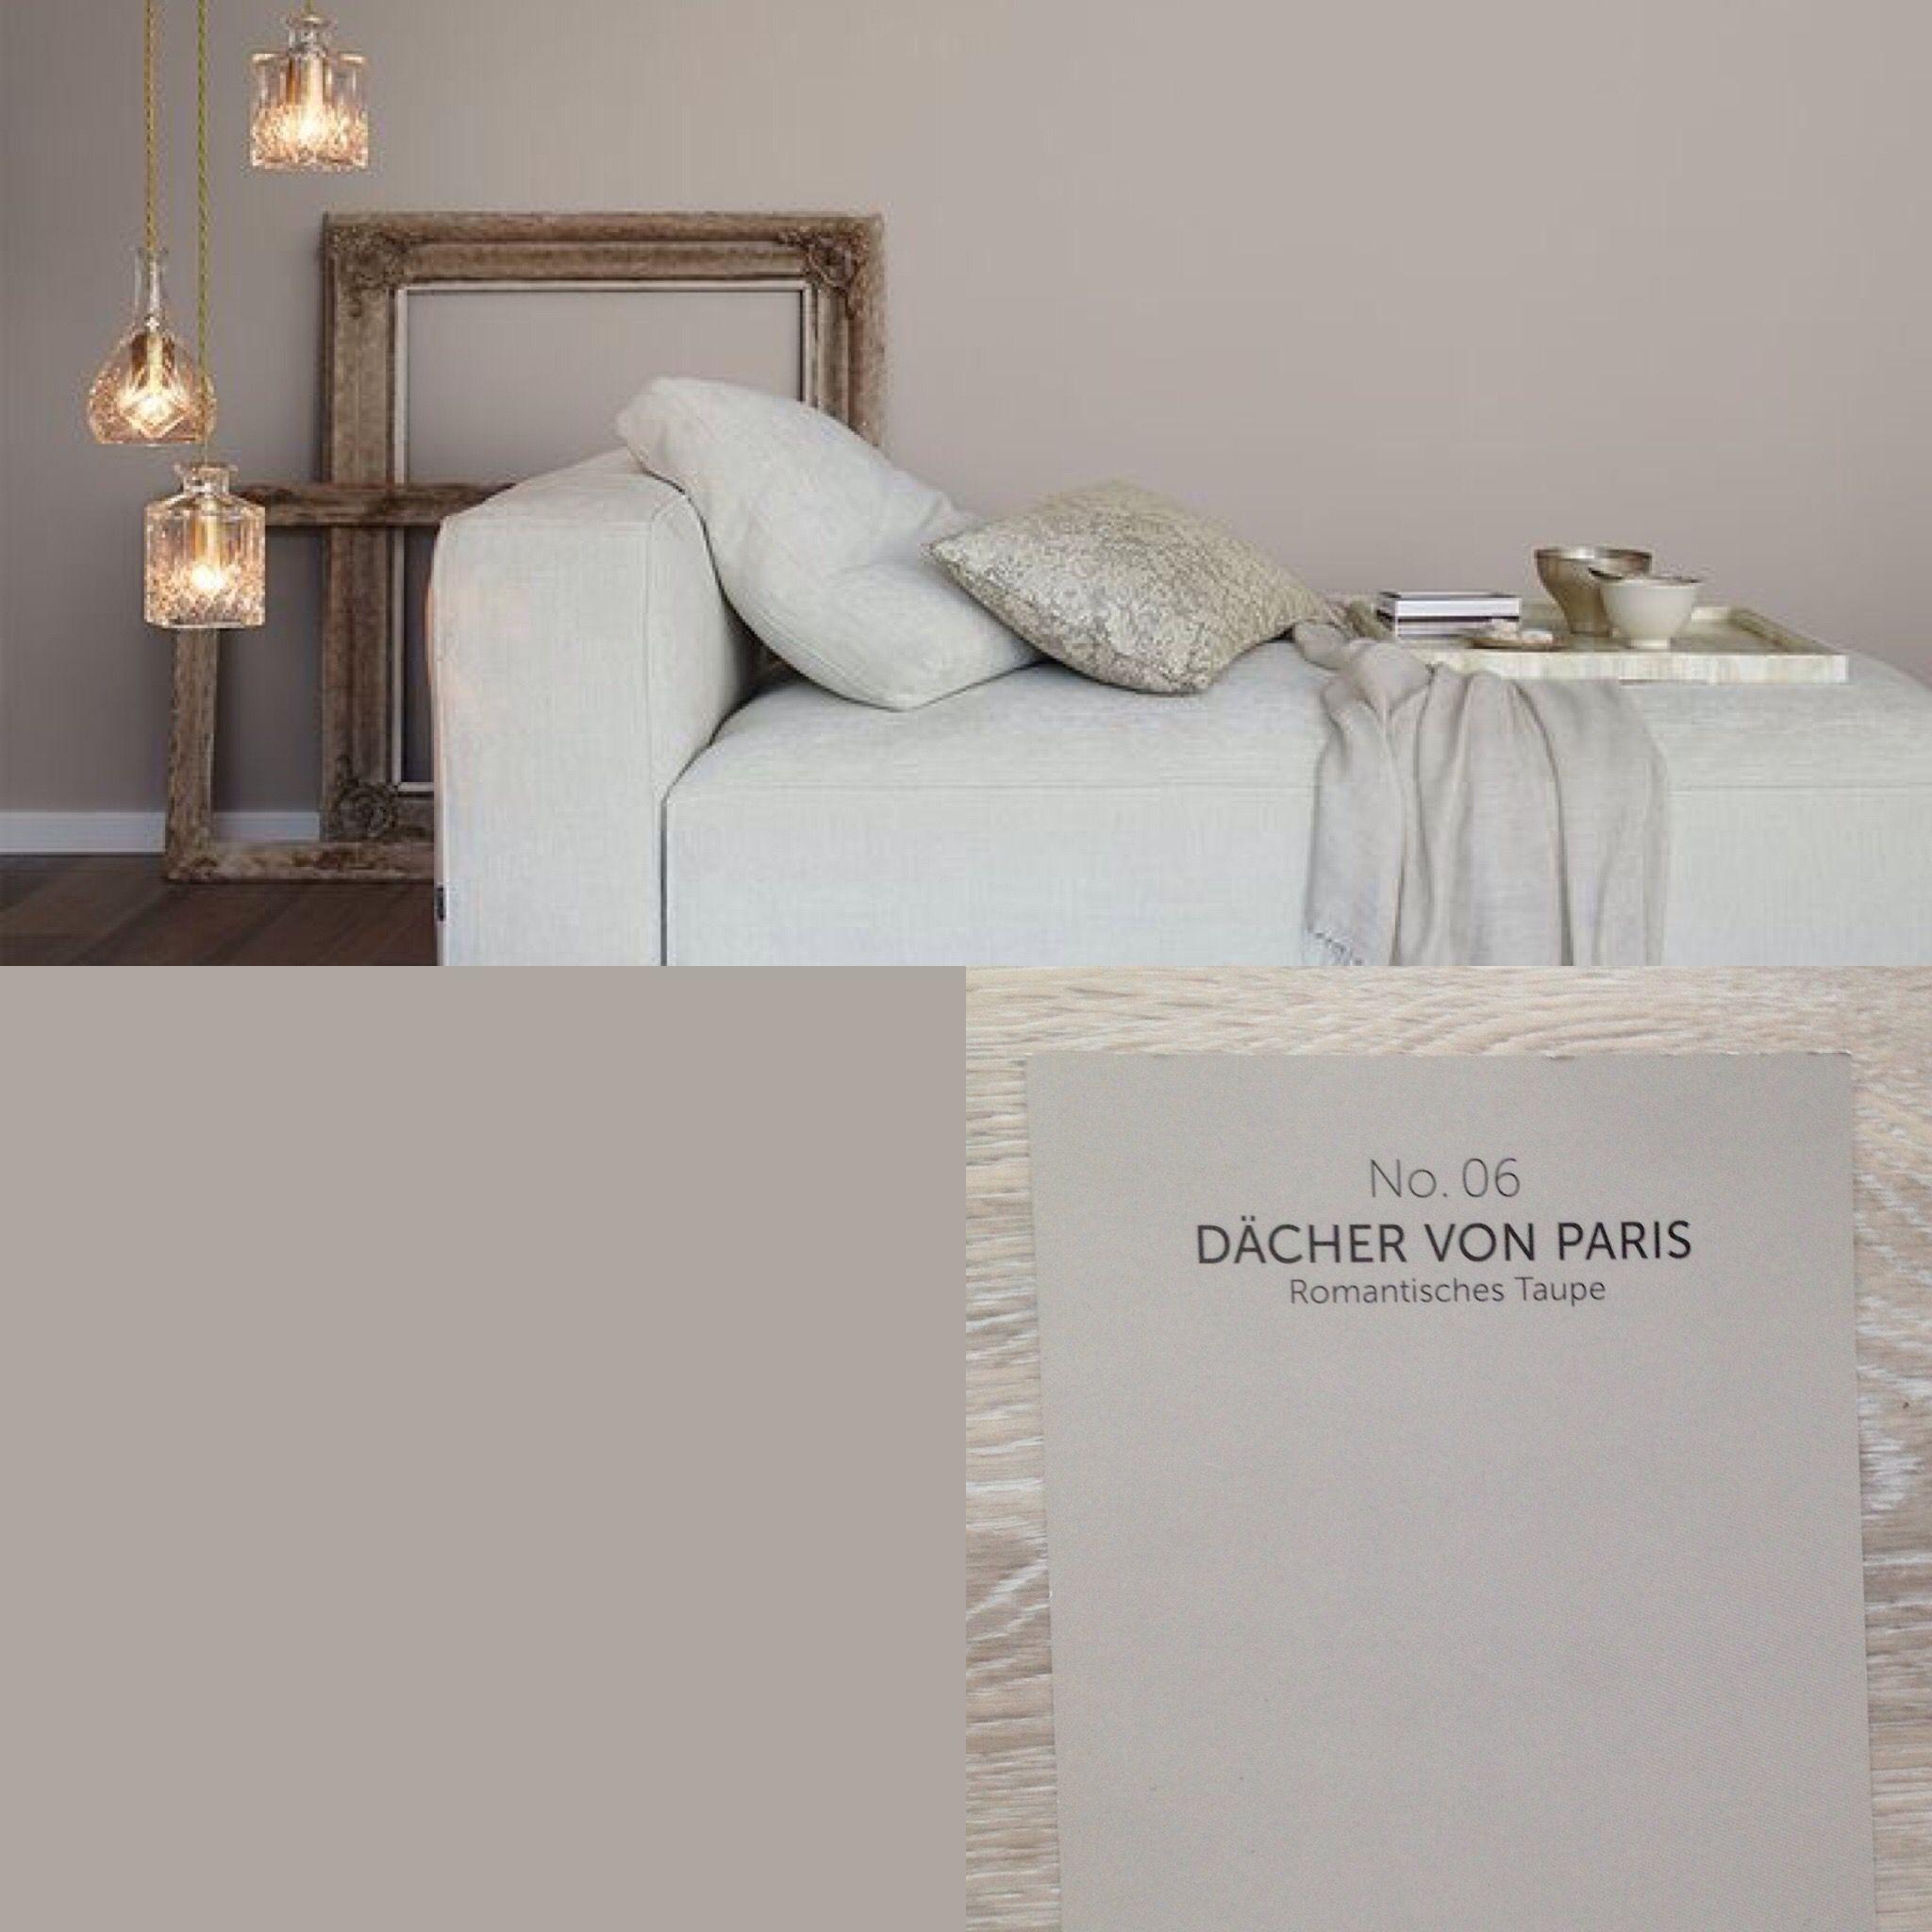 Alpina Fine Colors Pariser Dacher Fur Unser Zukunftiges